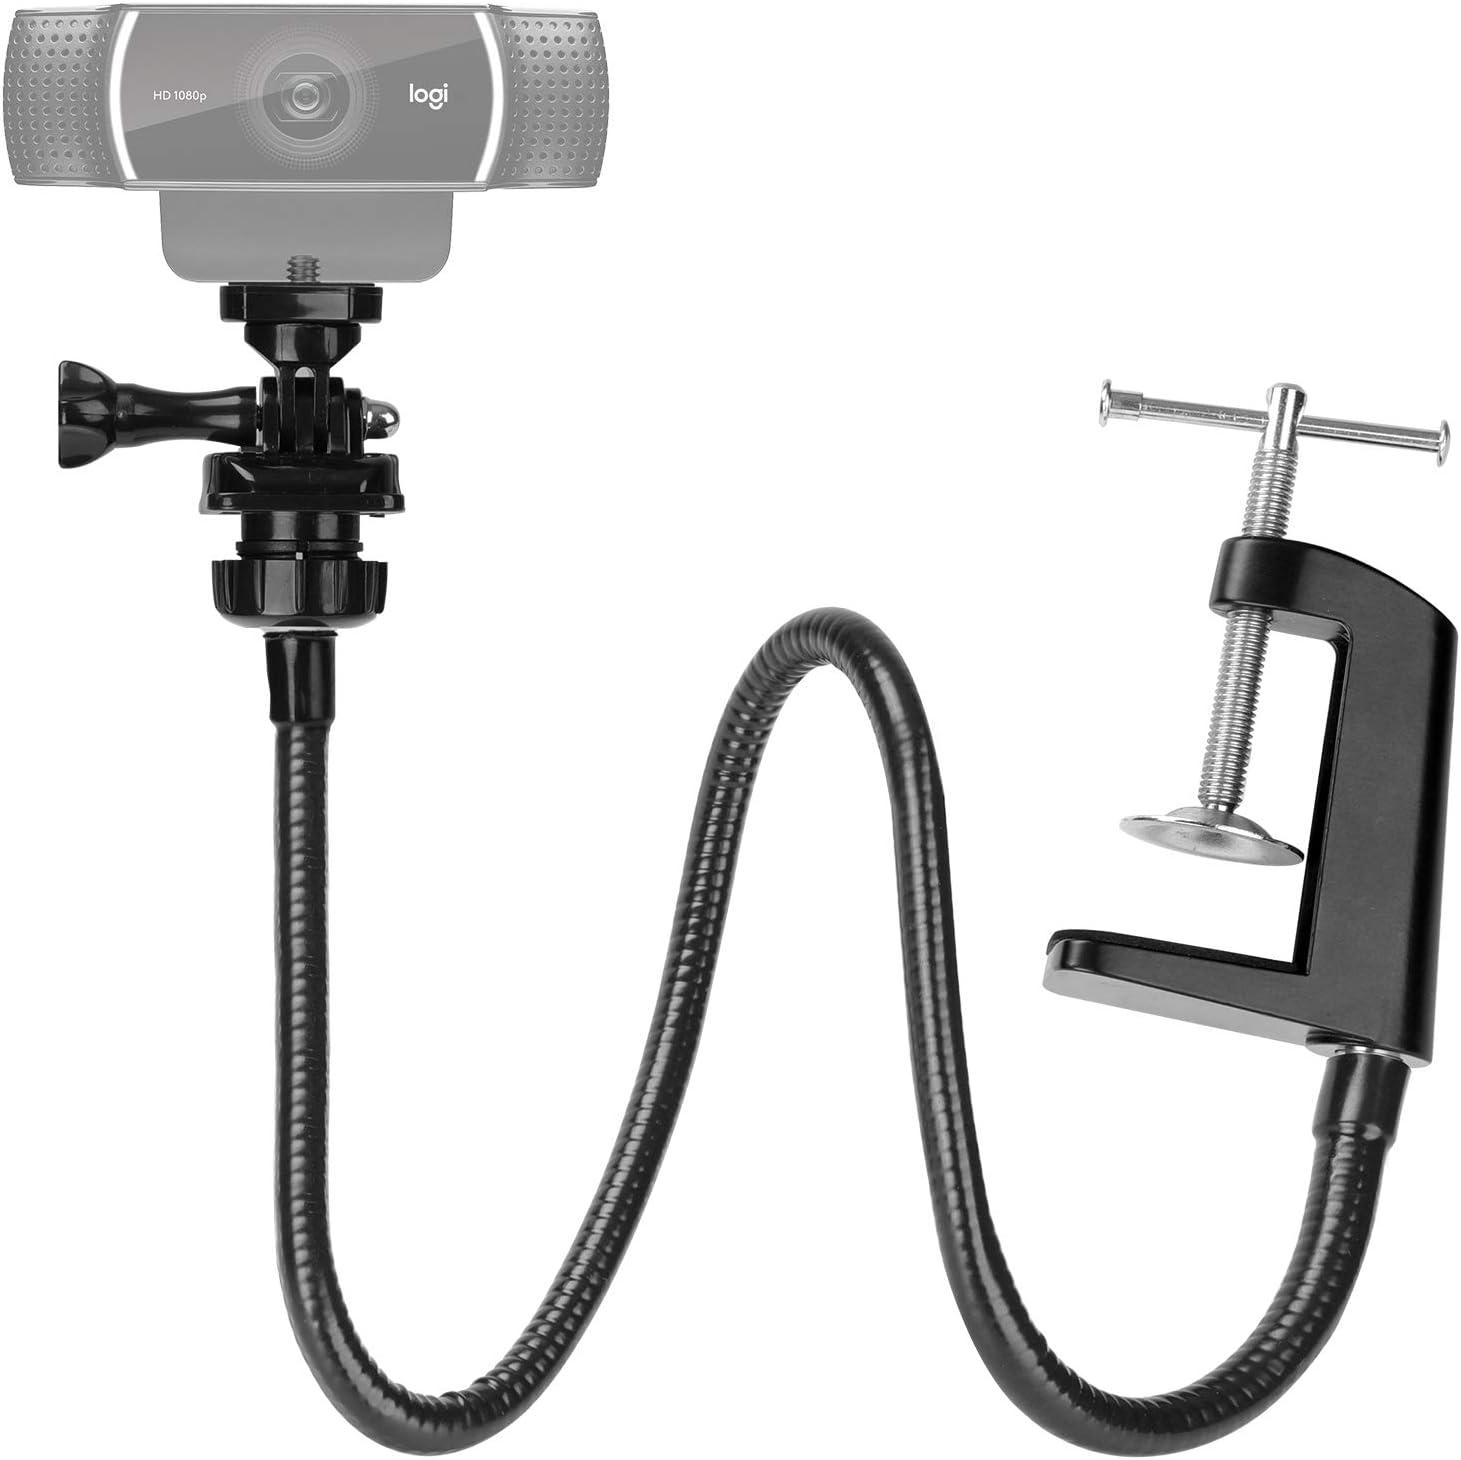 25 Inch Webcam Stand - Enhanced Desk Jaw Clamp with Flexible Gooseneck Stand for Logitech Webcam C920,C922,C922x,C930,C615,C925e,Brio 4K by AMADA HOMEFURNISHING